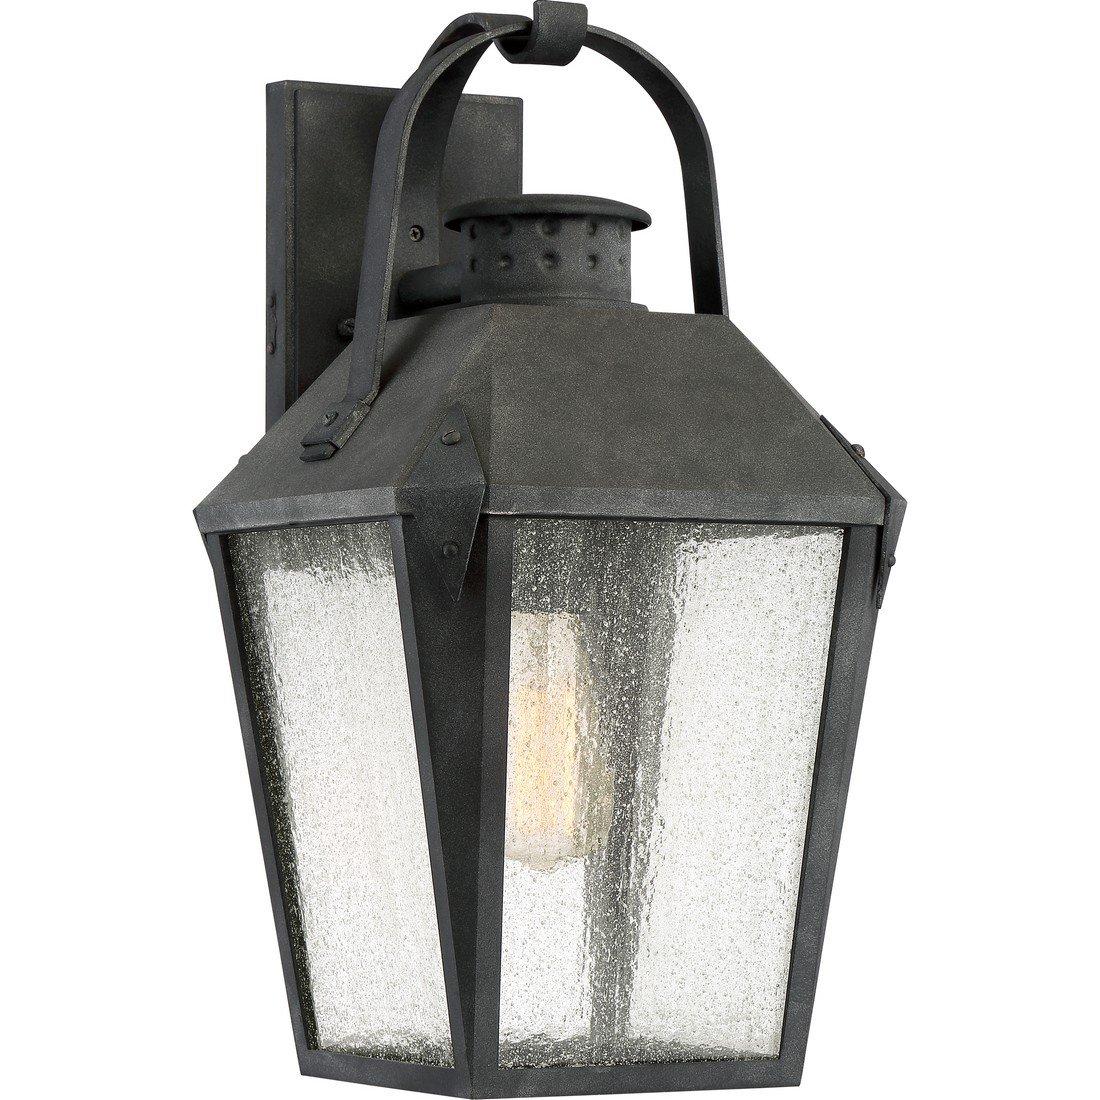 Quoizel One Light Outdoor Wall Lantern CRG8410MB, Large, Mottled Black